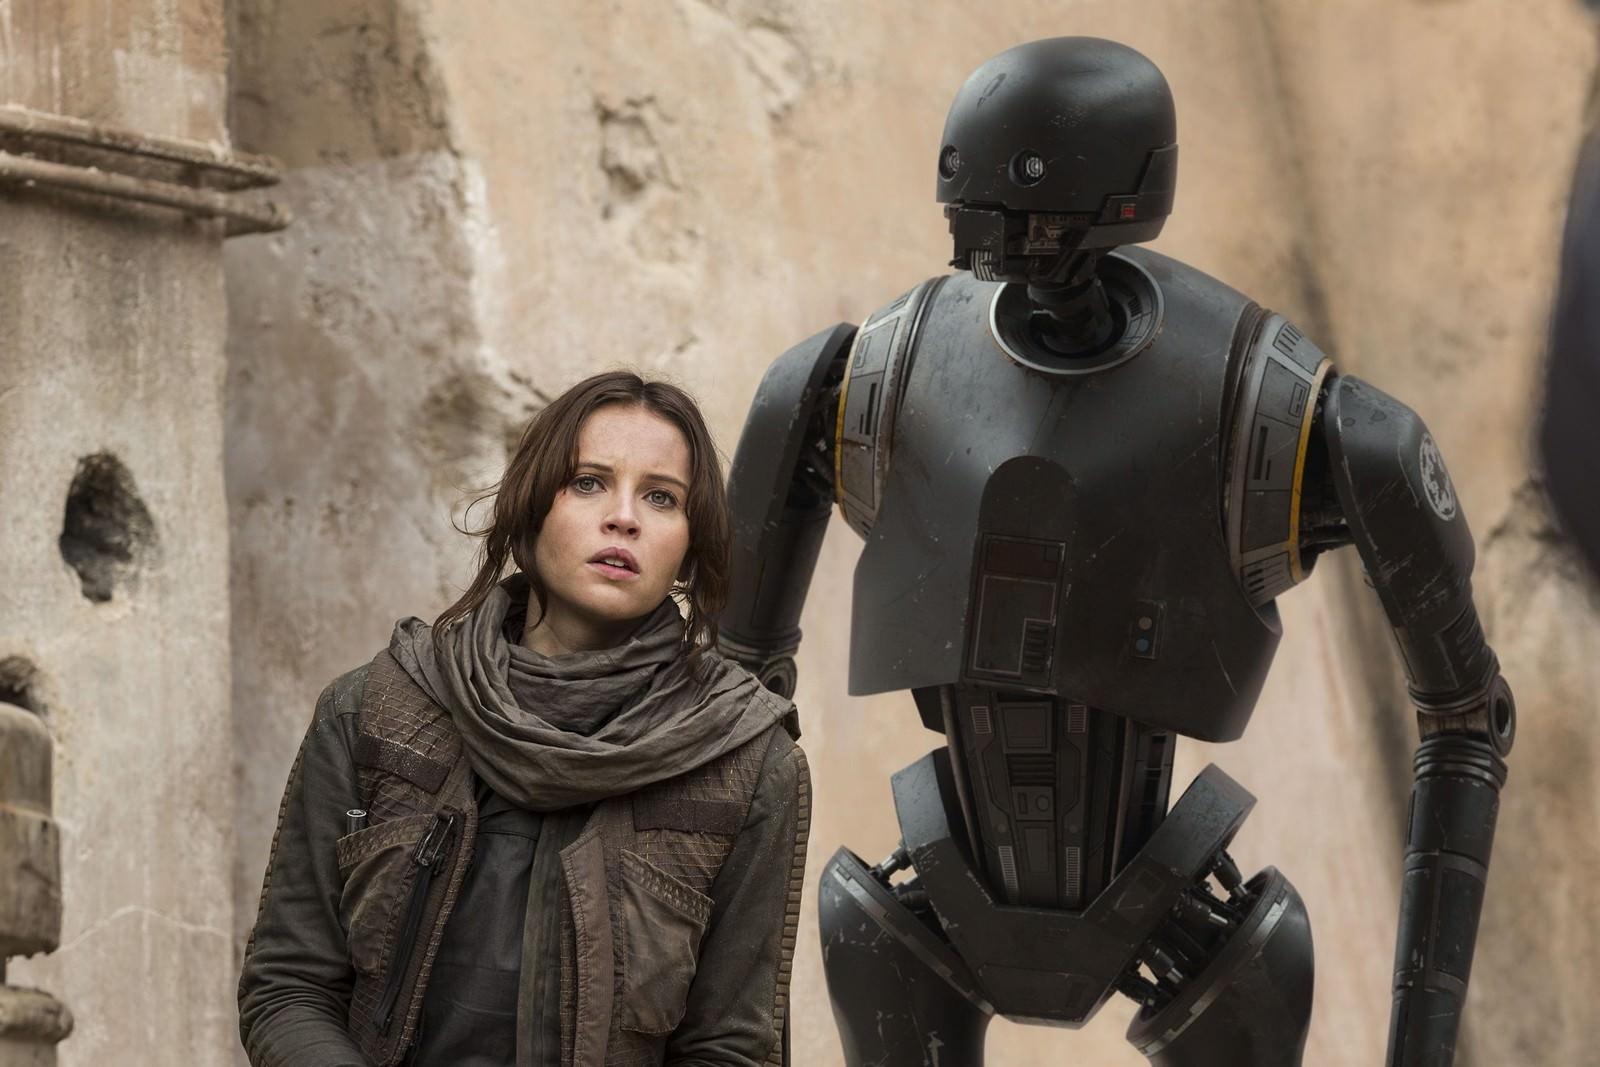 Movie, Rogue One: A Star Wars Story(美國, 2016) / 星際大戰外傳:俠盜一號(台灣.香港) / 星球大战外传:侠盗一号(中國), 電影劇照